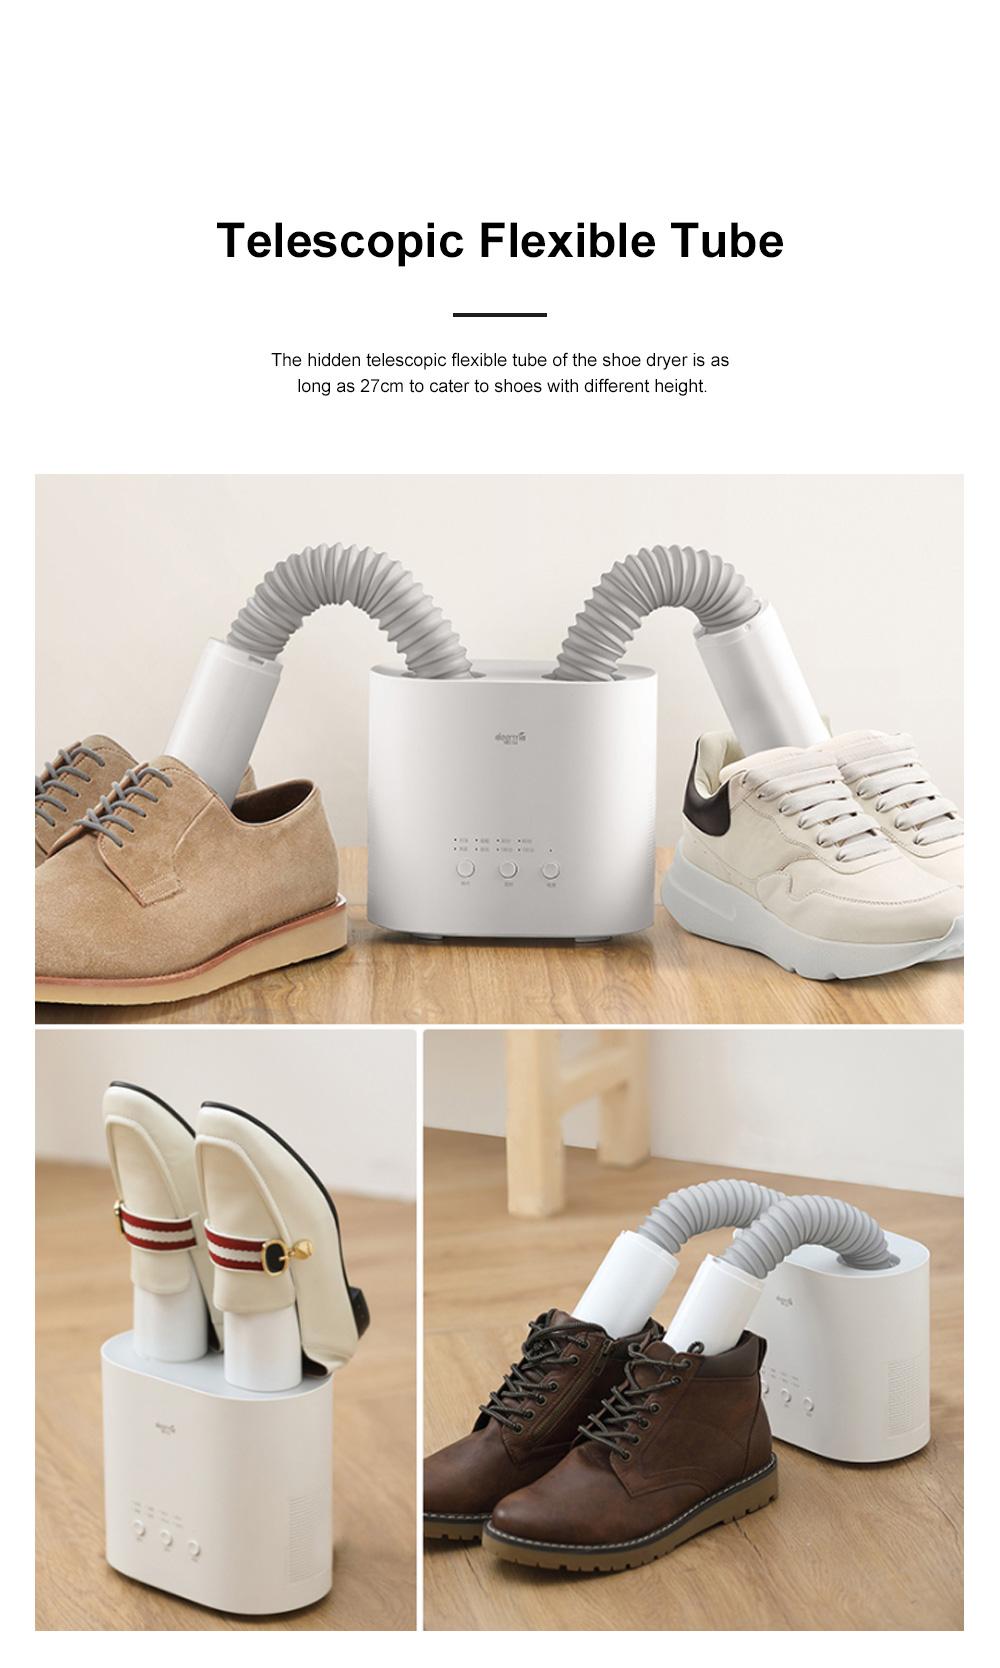 DEERMA Multiple-effect Shoe Dryer for Family Use Deodorizing and Sterilizing Drying Machine Multifunctional Telescopic Shoe Dryer 9